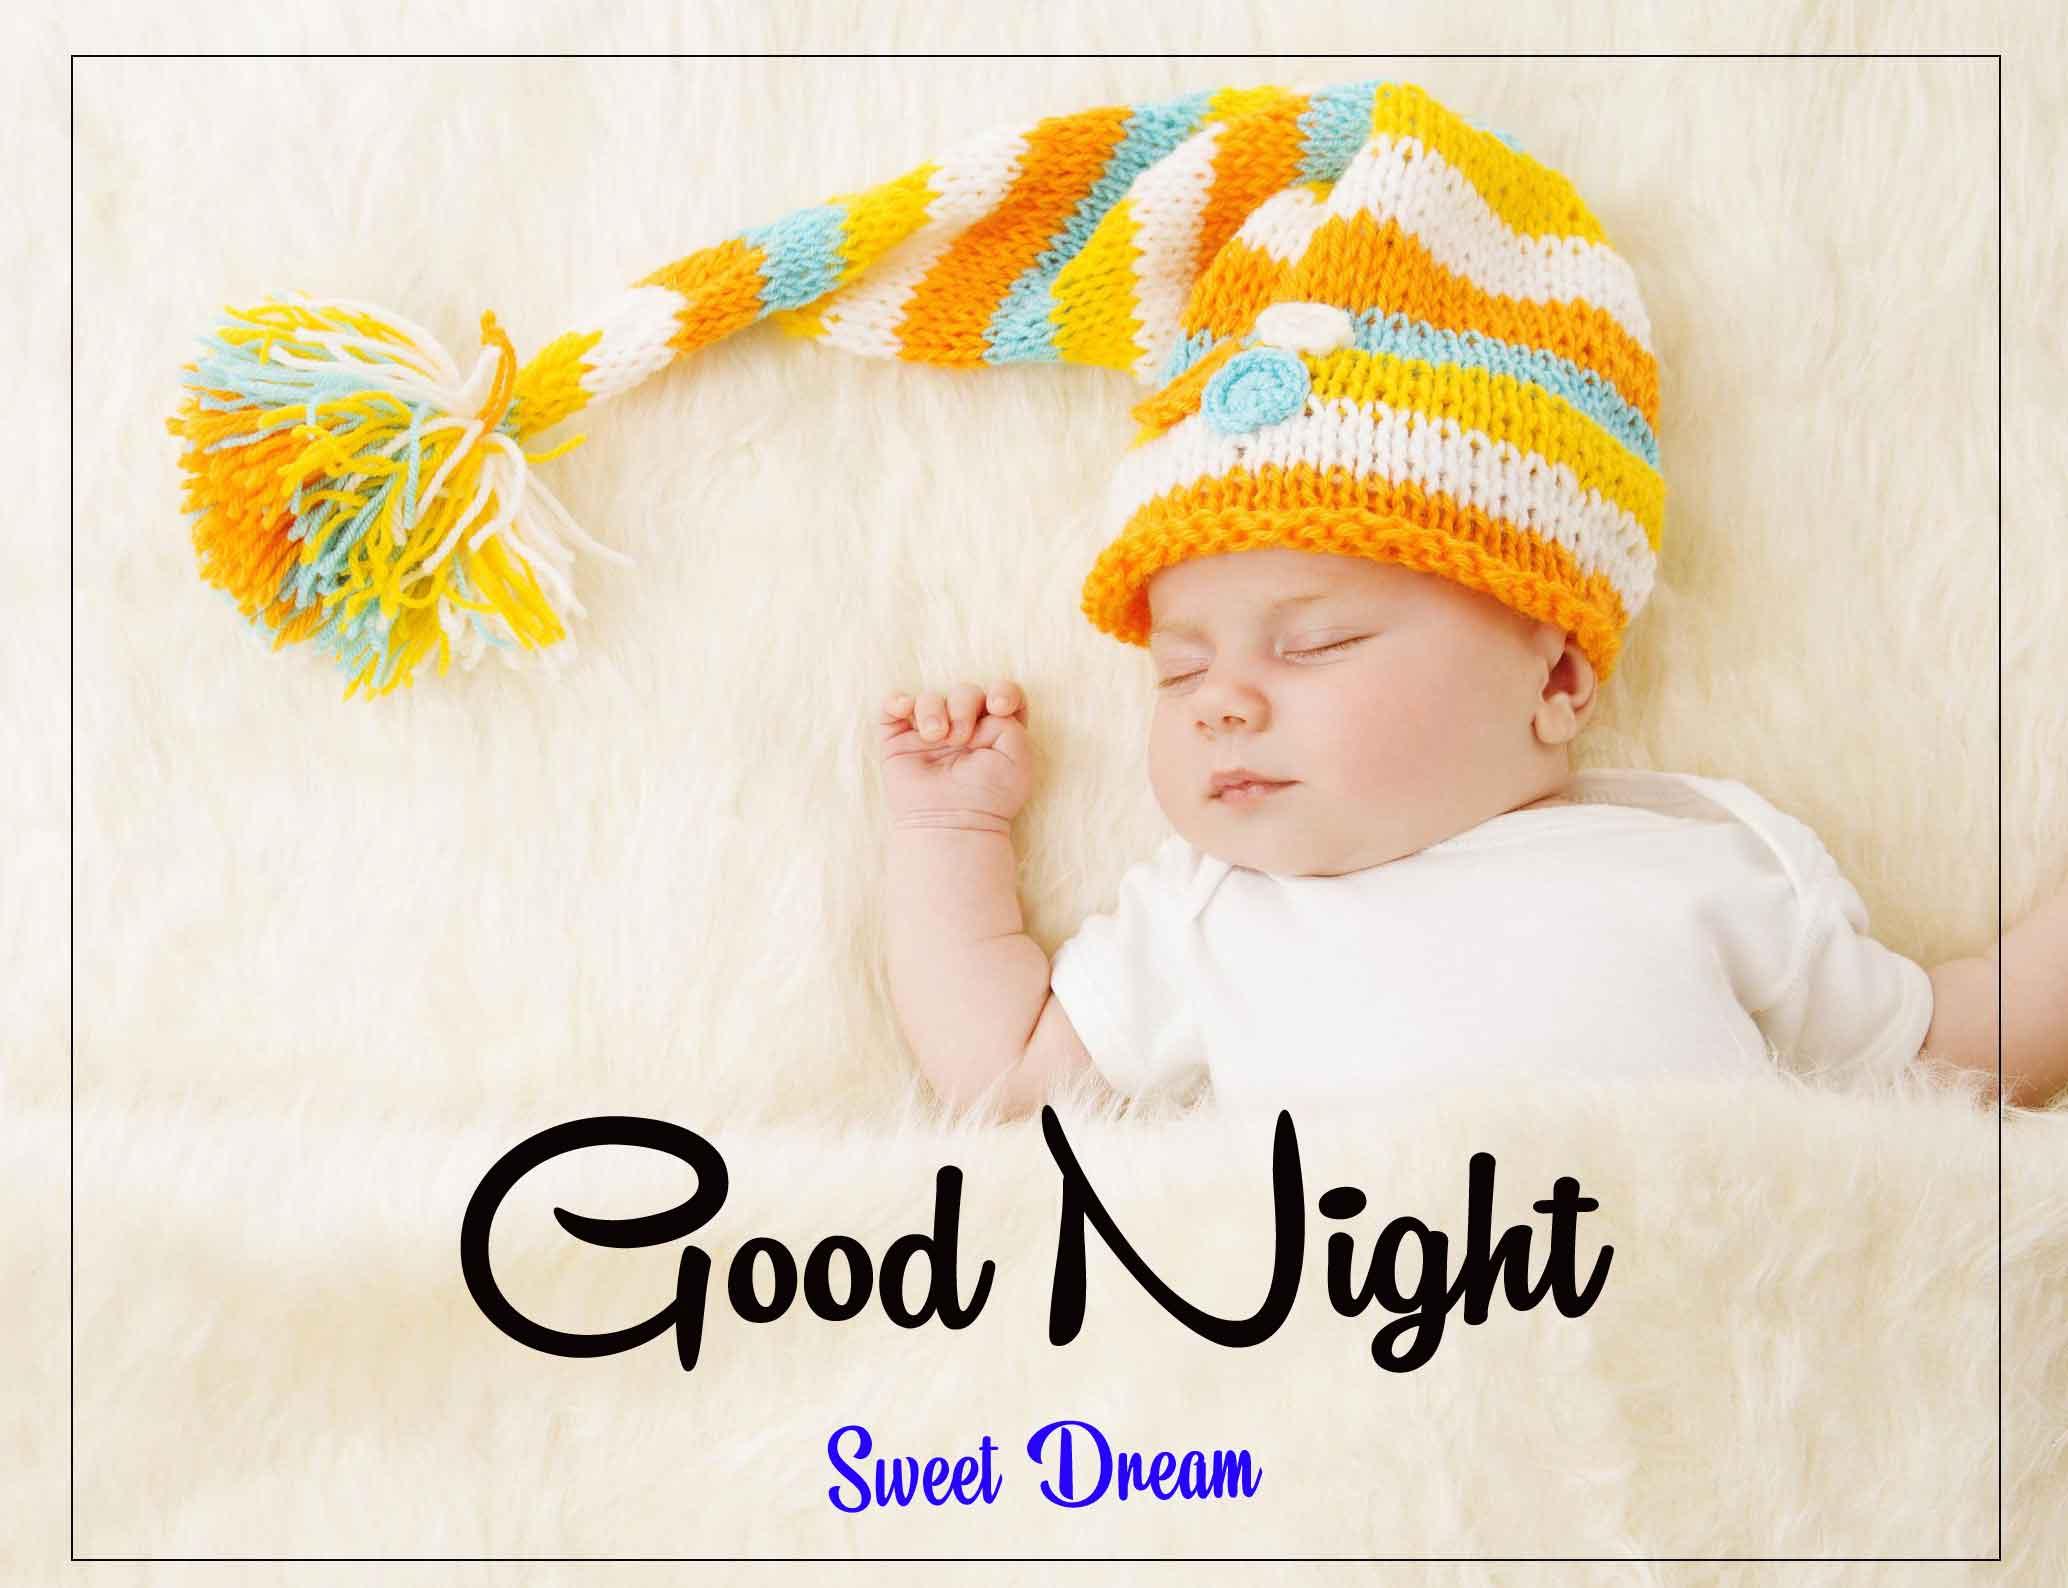 Friend Beautiful Cute Good Night Images